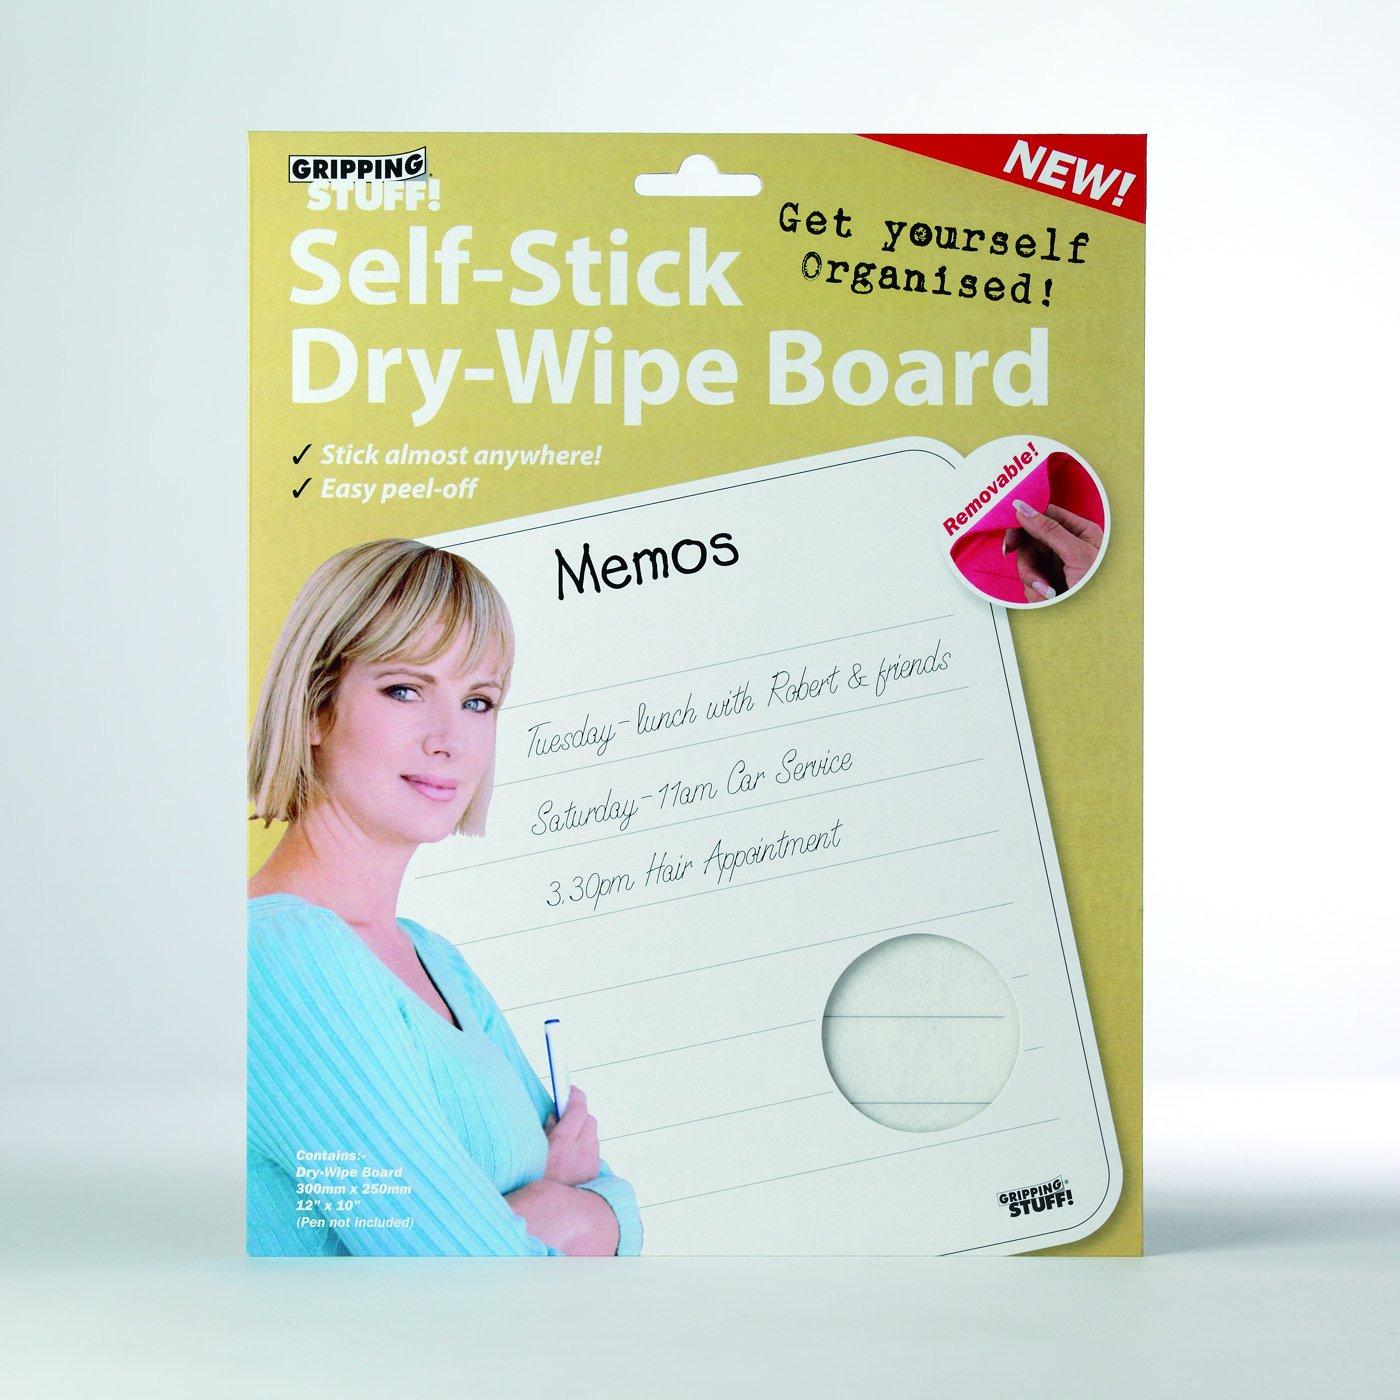 Memo Board - Self Stick Dry Wipe Board - Memo Gripping Stuff